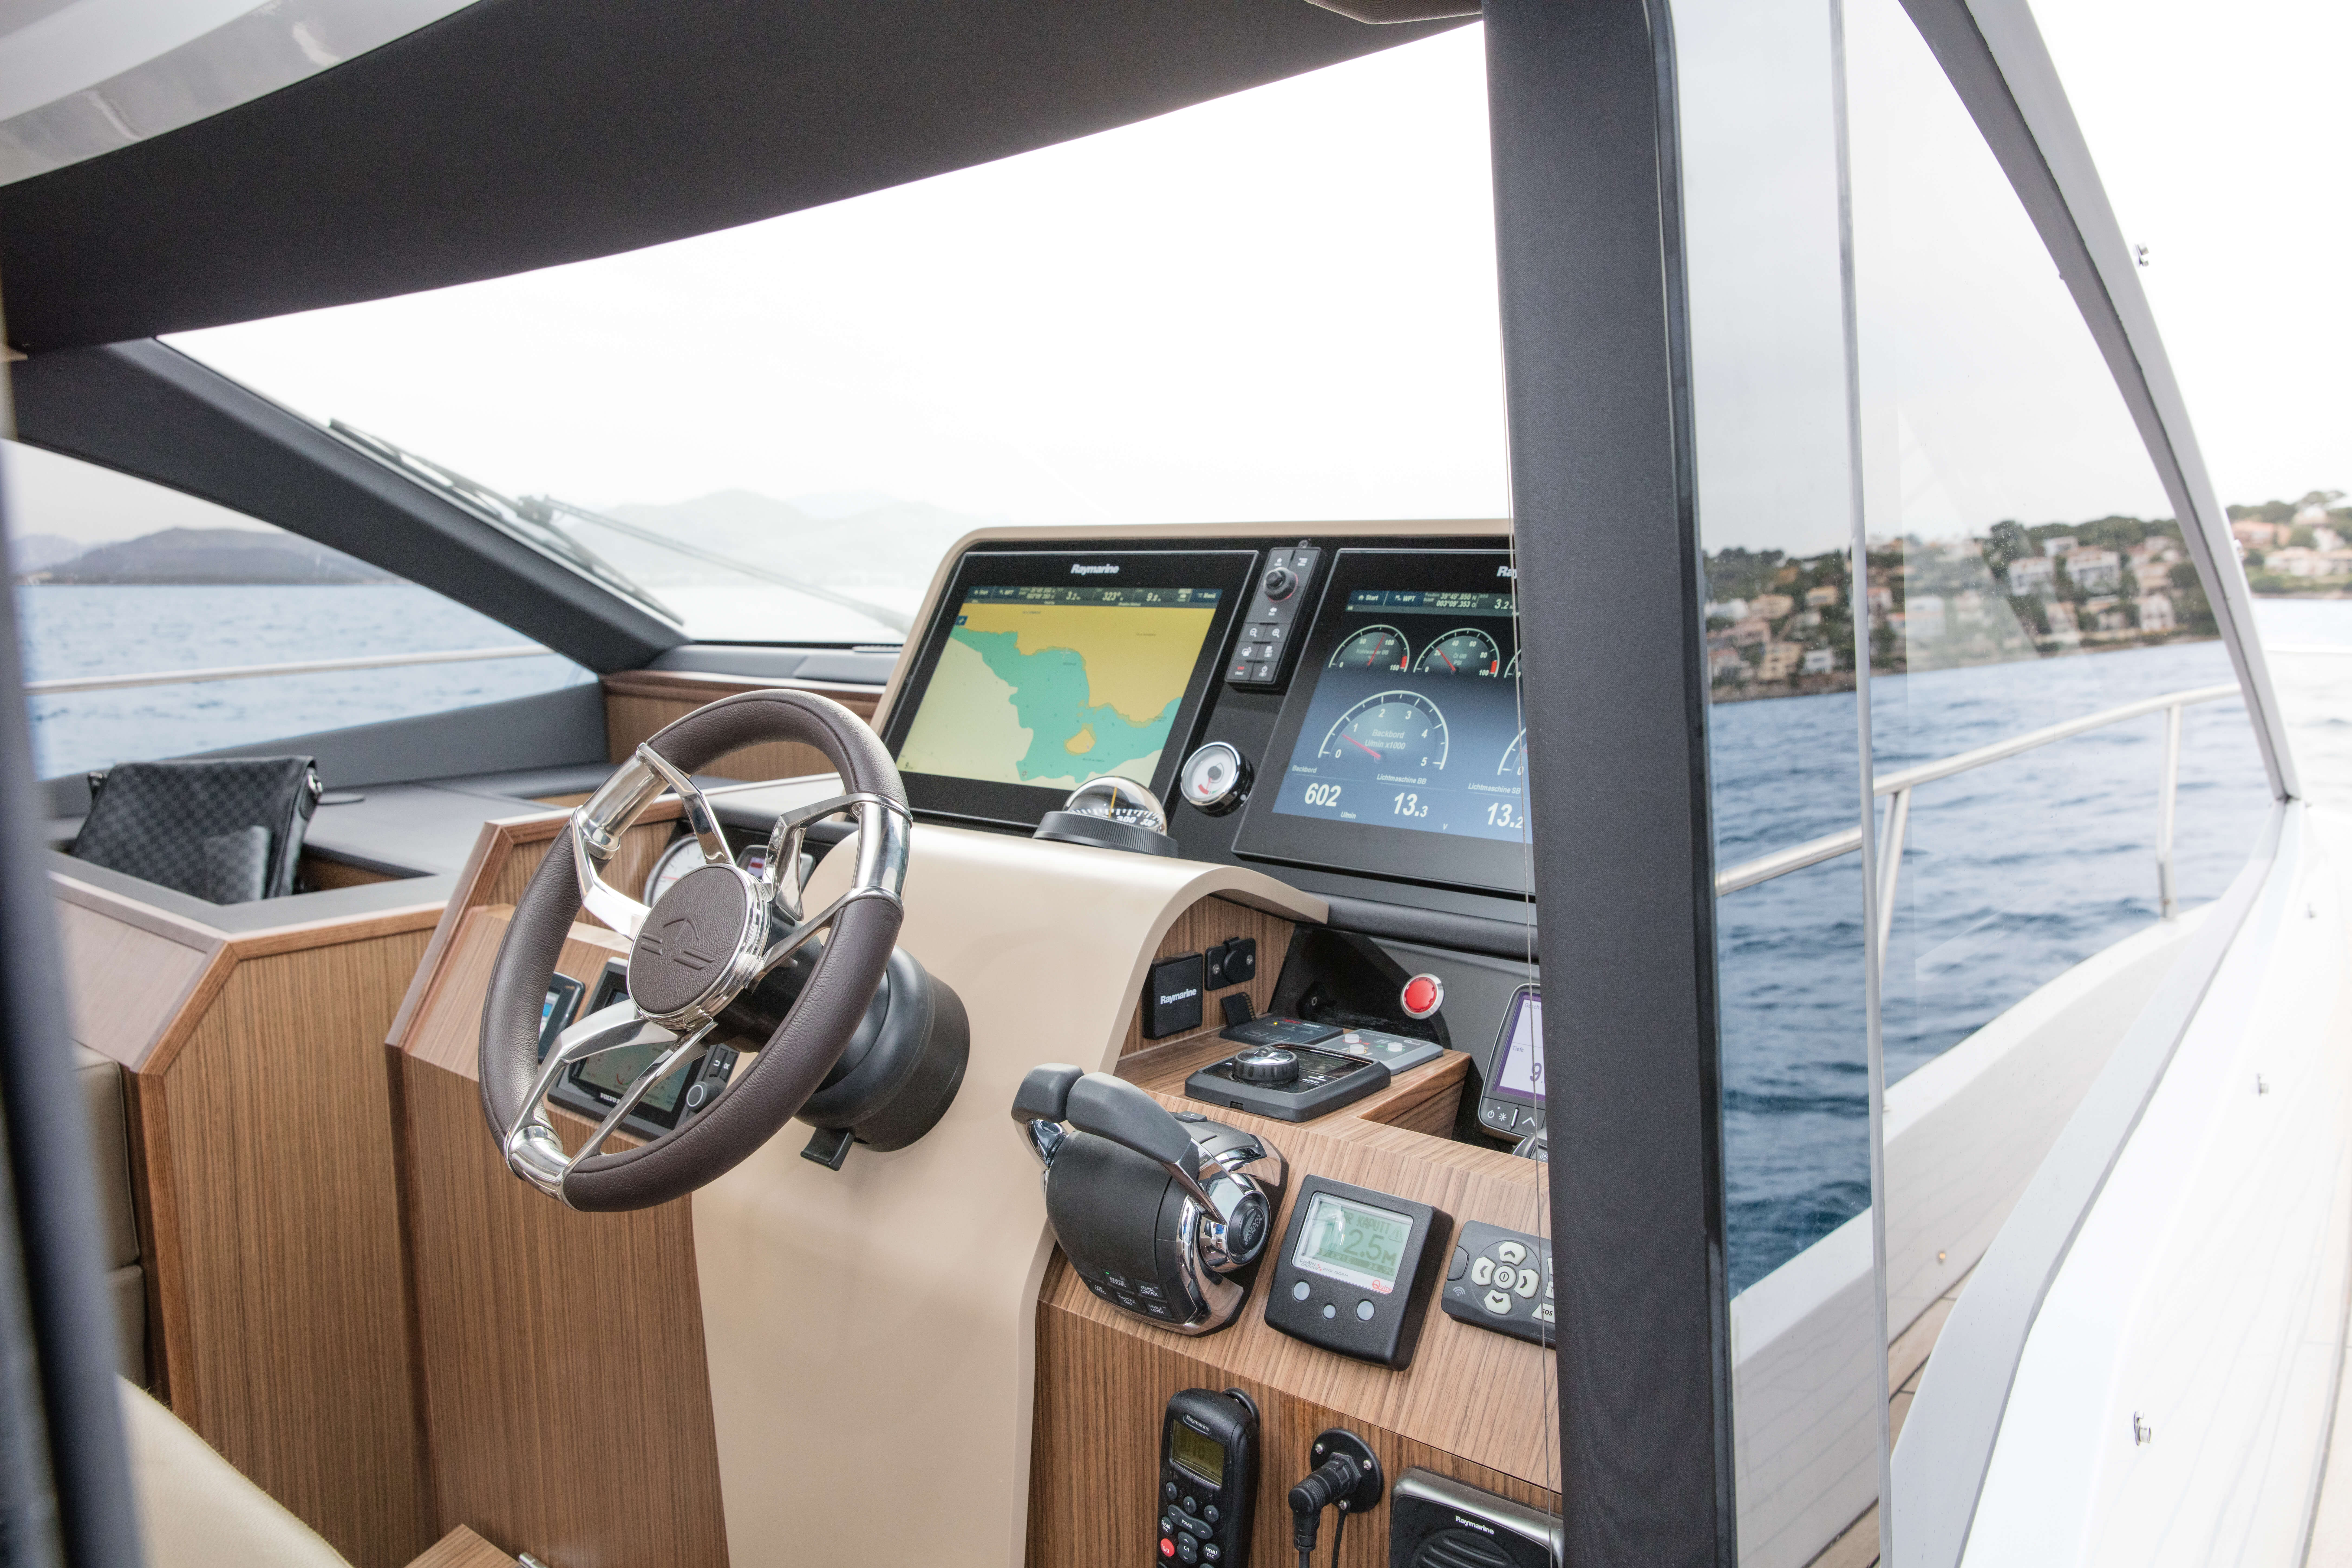 Sealine F530: Interior